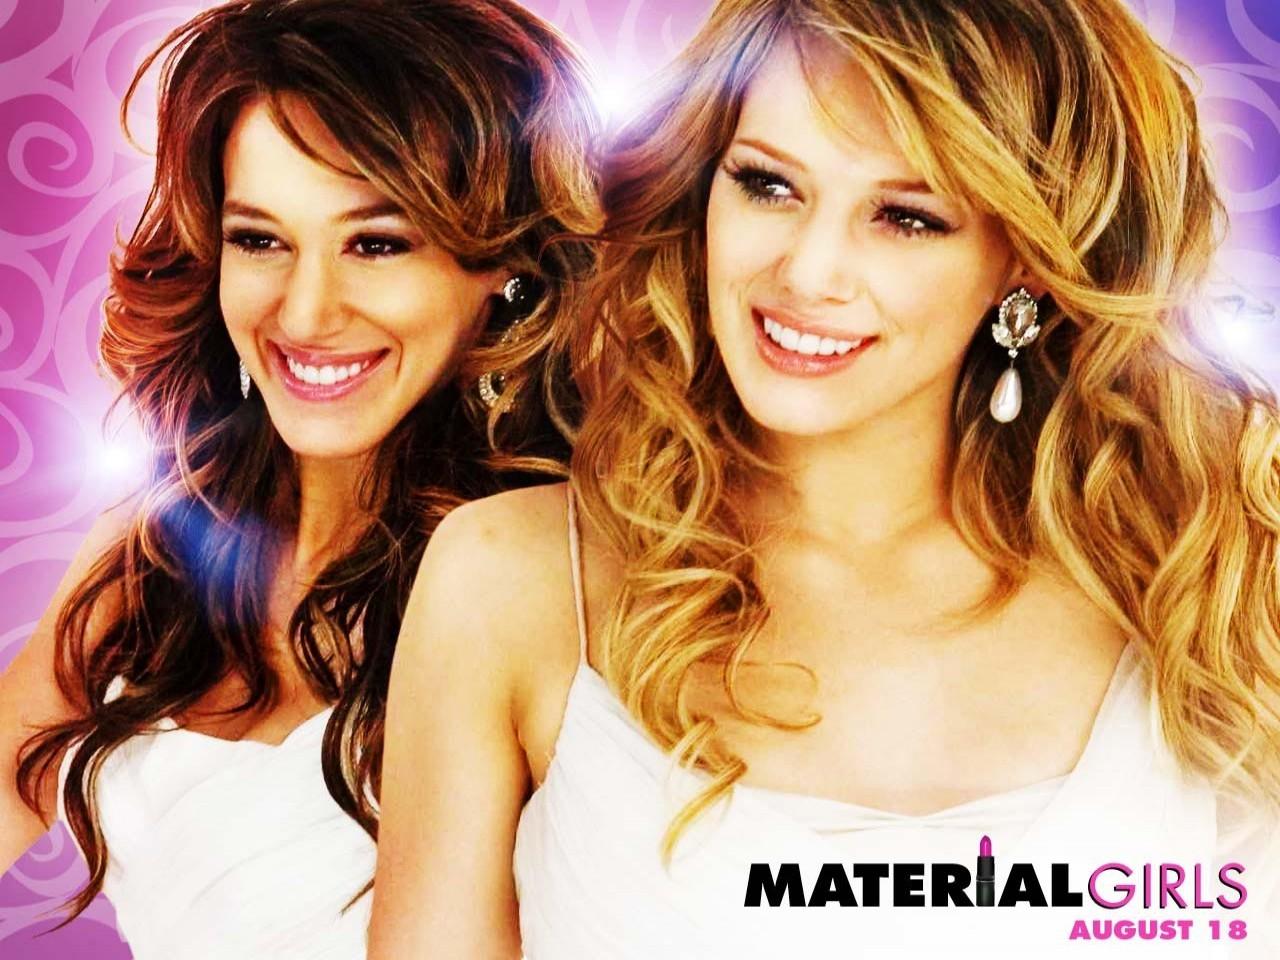 Wallpaper del film Material Girls con Haylie e Hilary Duff